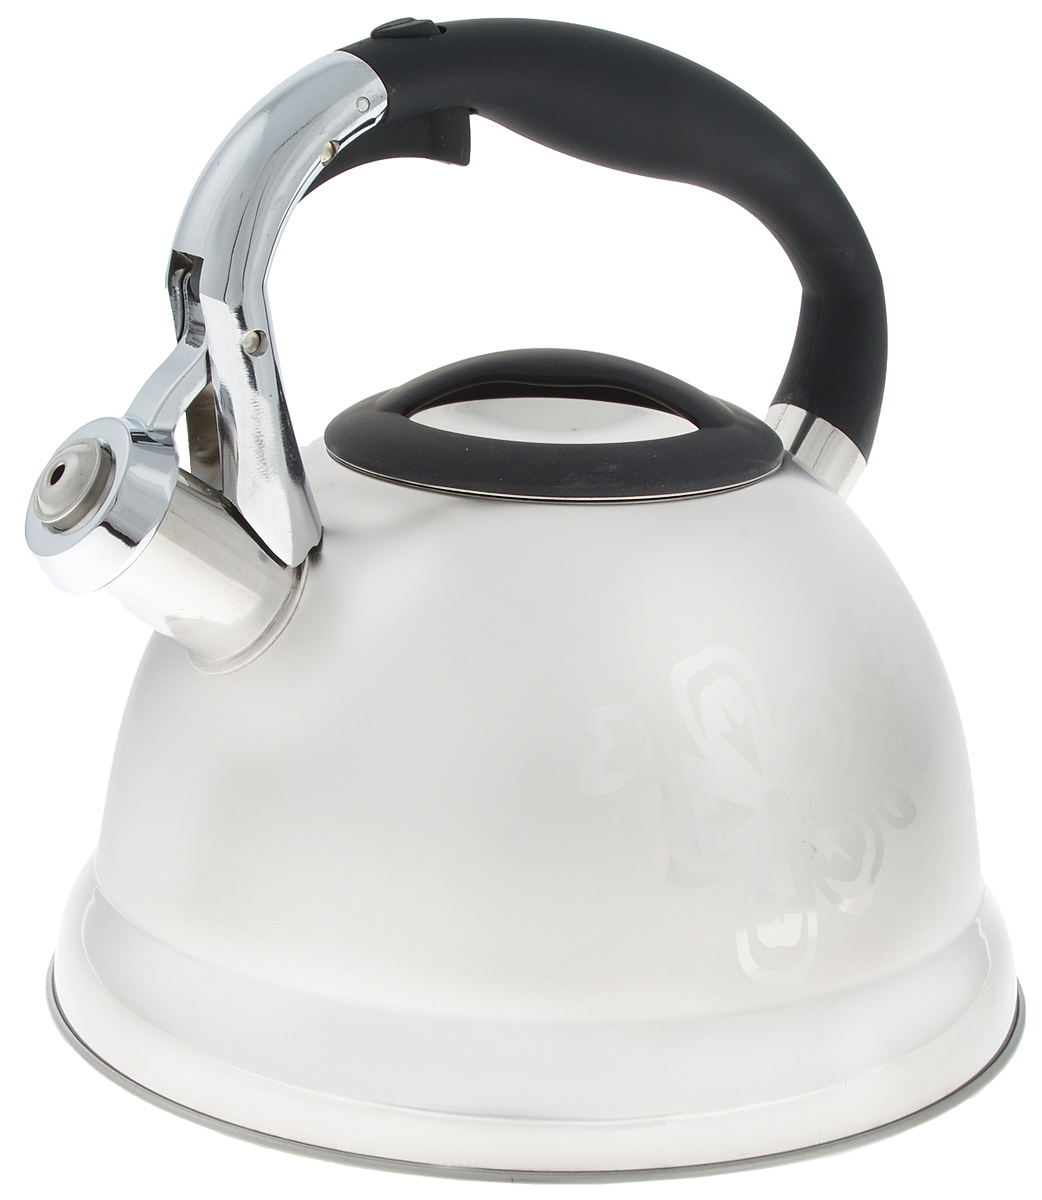 Чайник Hoffmann, со свистком, 3 л. HM 5544 чайник hoffmann со свистком цвет бежевый 2 л hm 5528 1